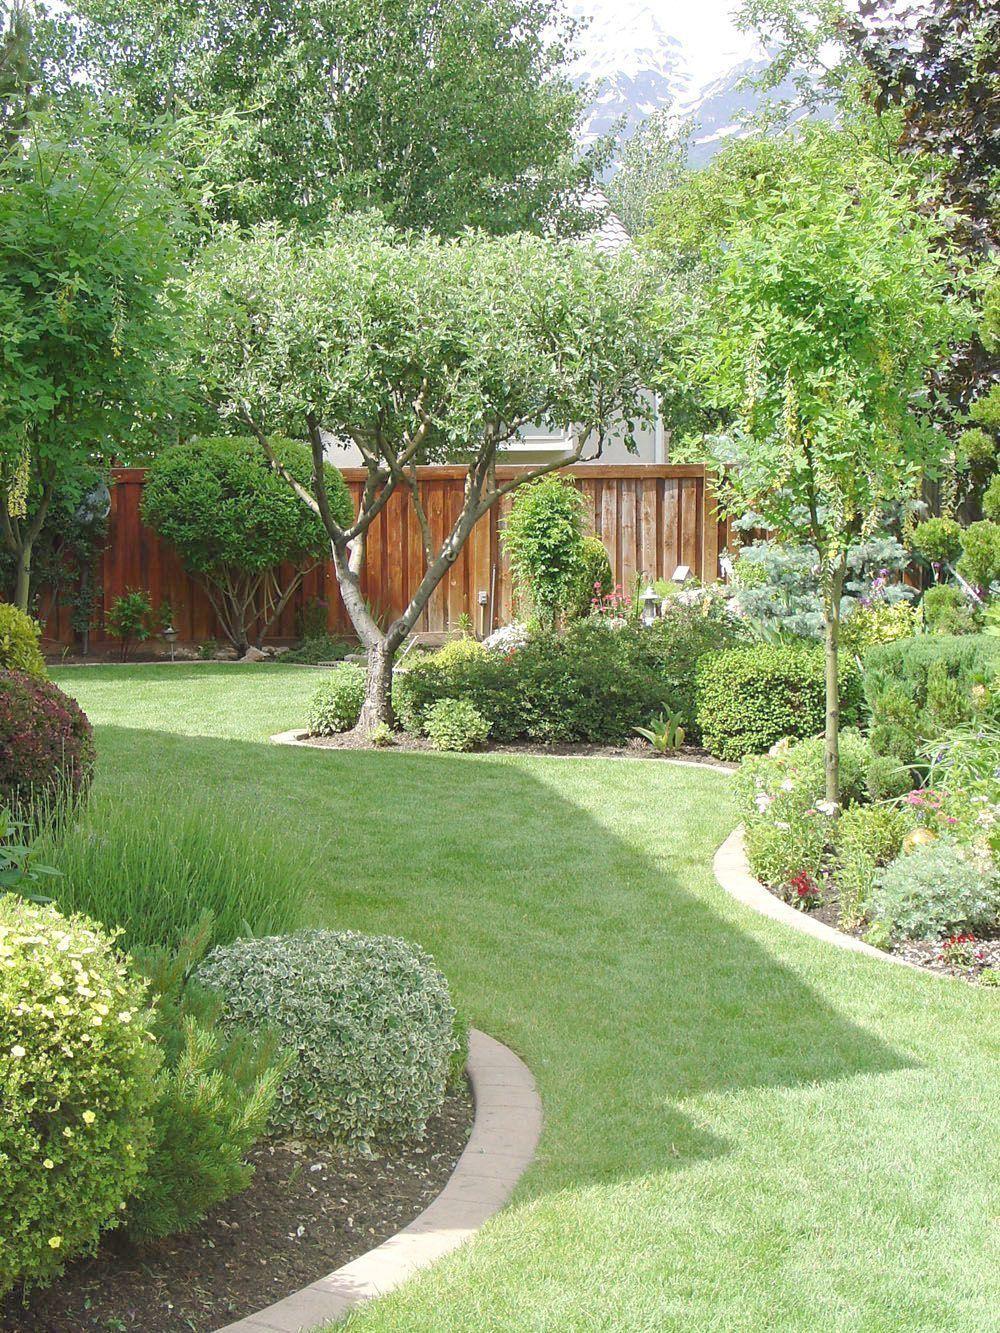 Organic Gardening Landscape Ideas Other Landscape Gardening Jobs Milton Keynes Beneath Landscape G Small Backyard Gardens Backyard Landscaping Landscape Design